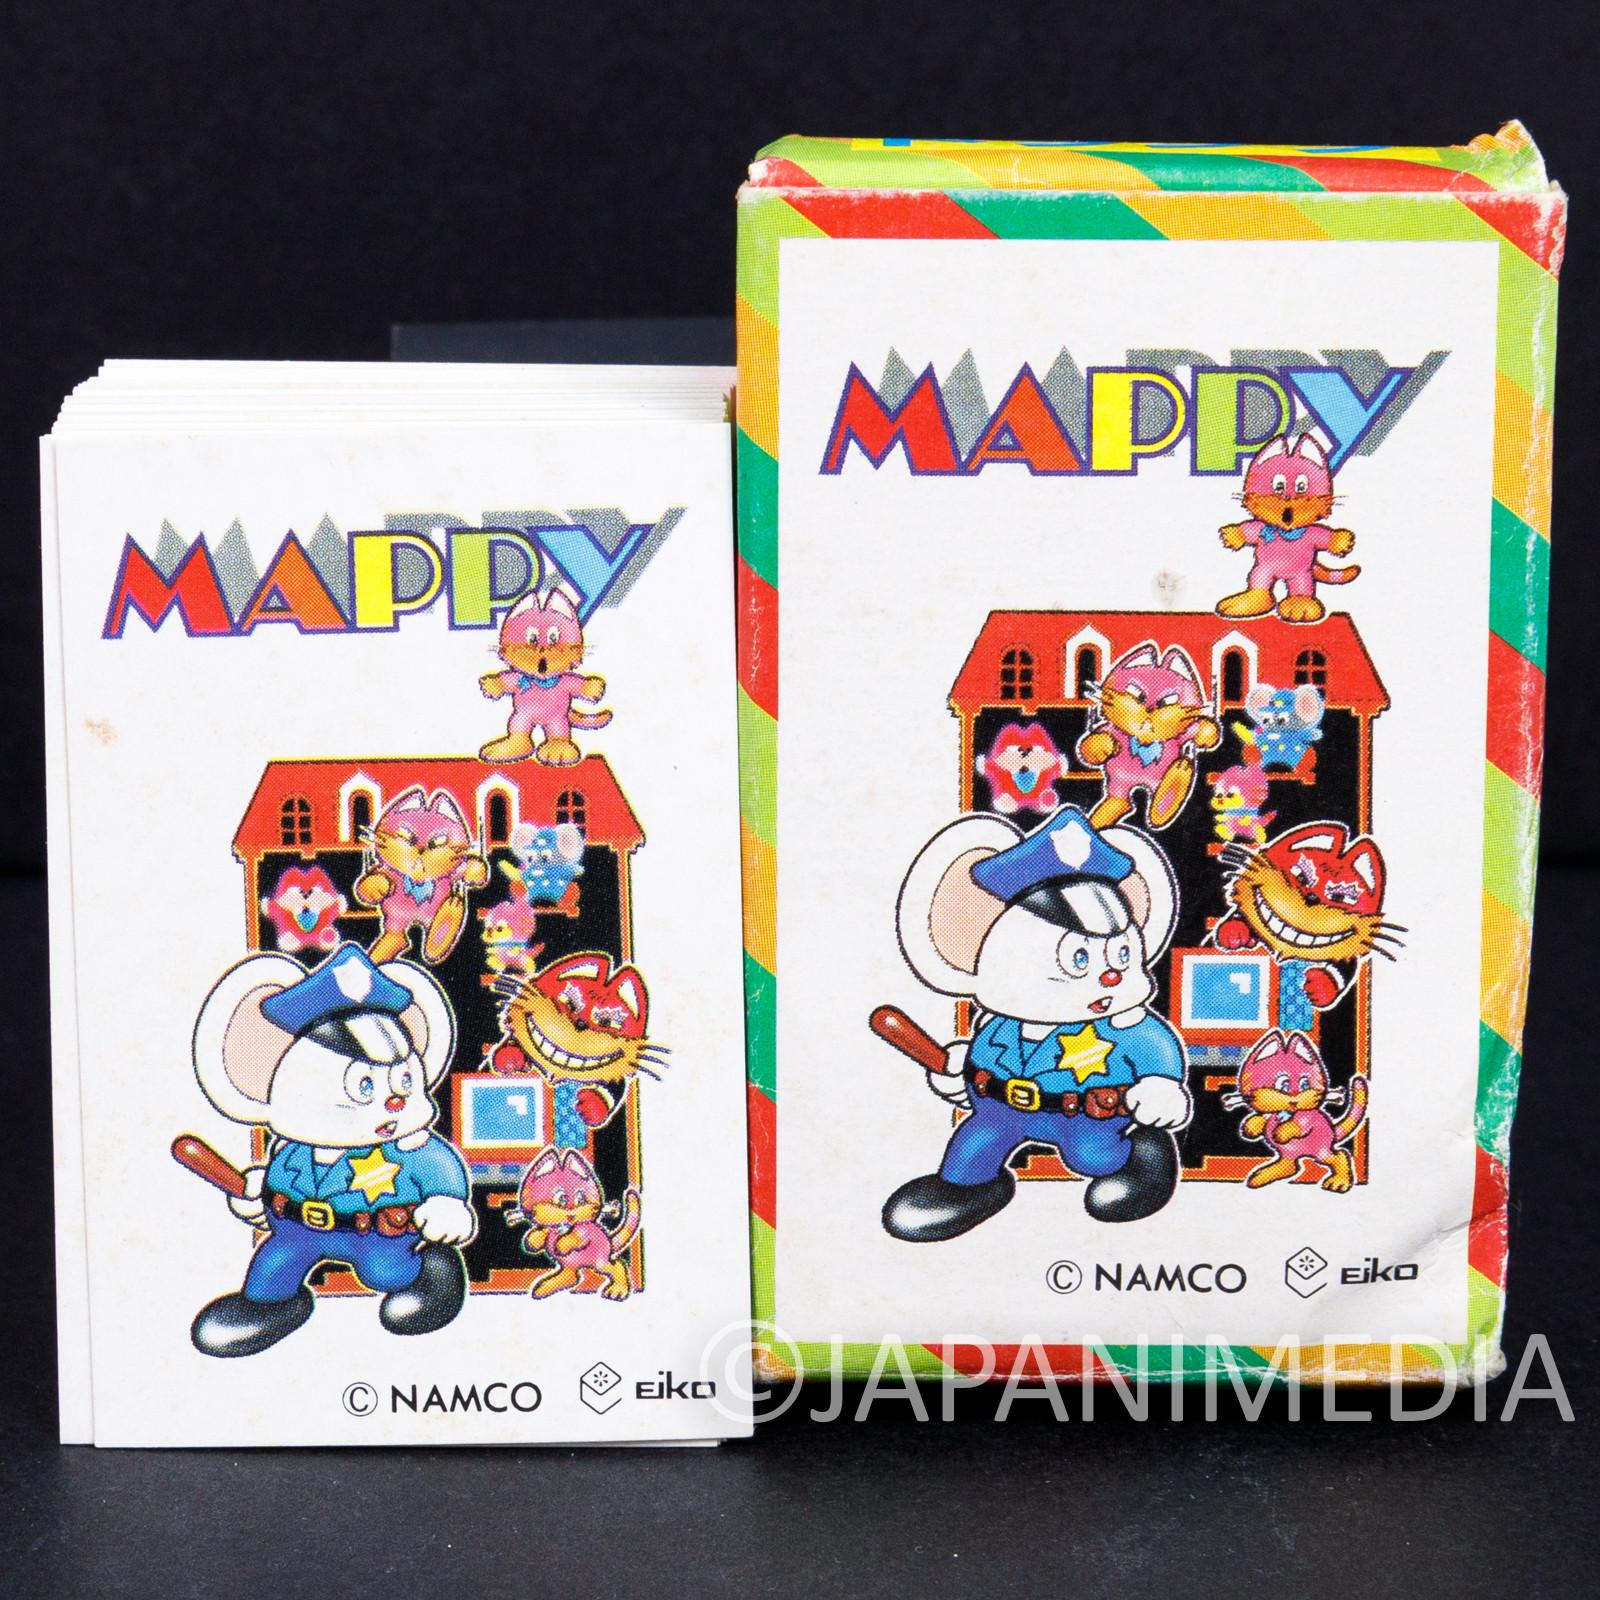 Retro RARE! Mappy Small Size Playing Cards Trump Namco JAPAN NES FAMICOM